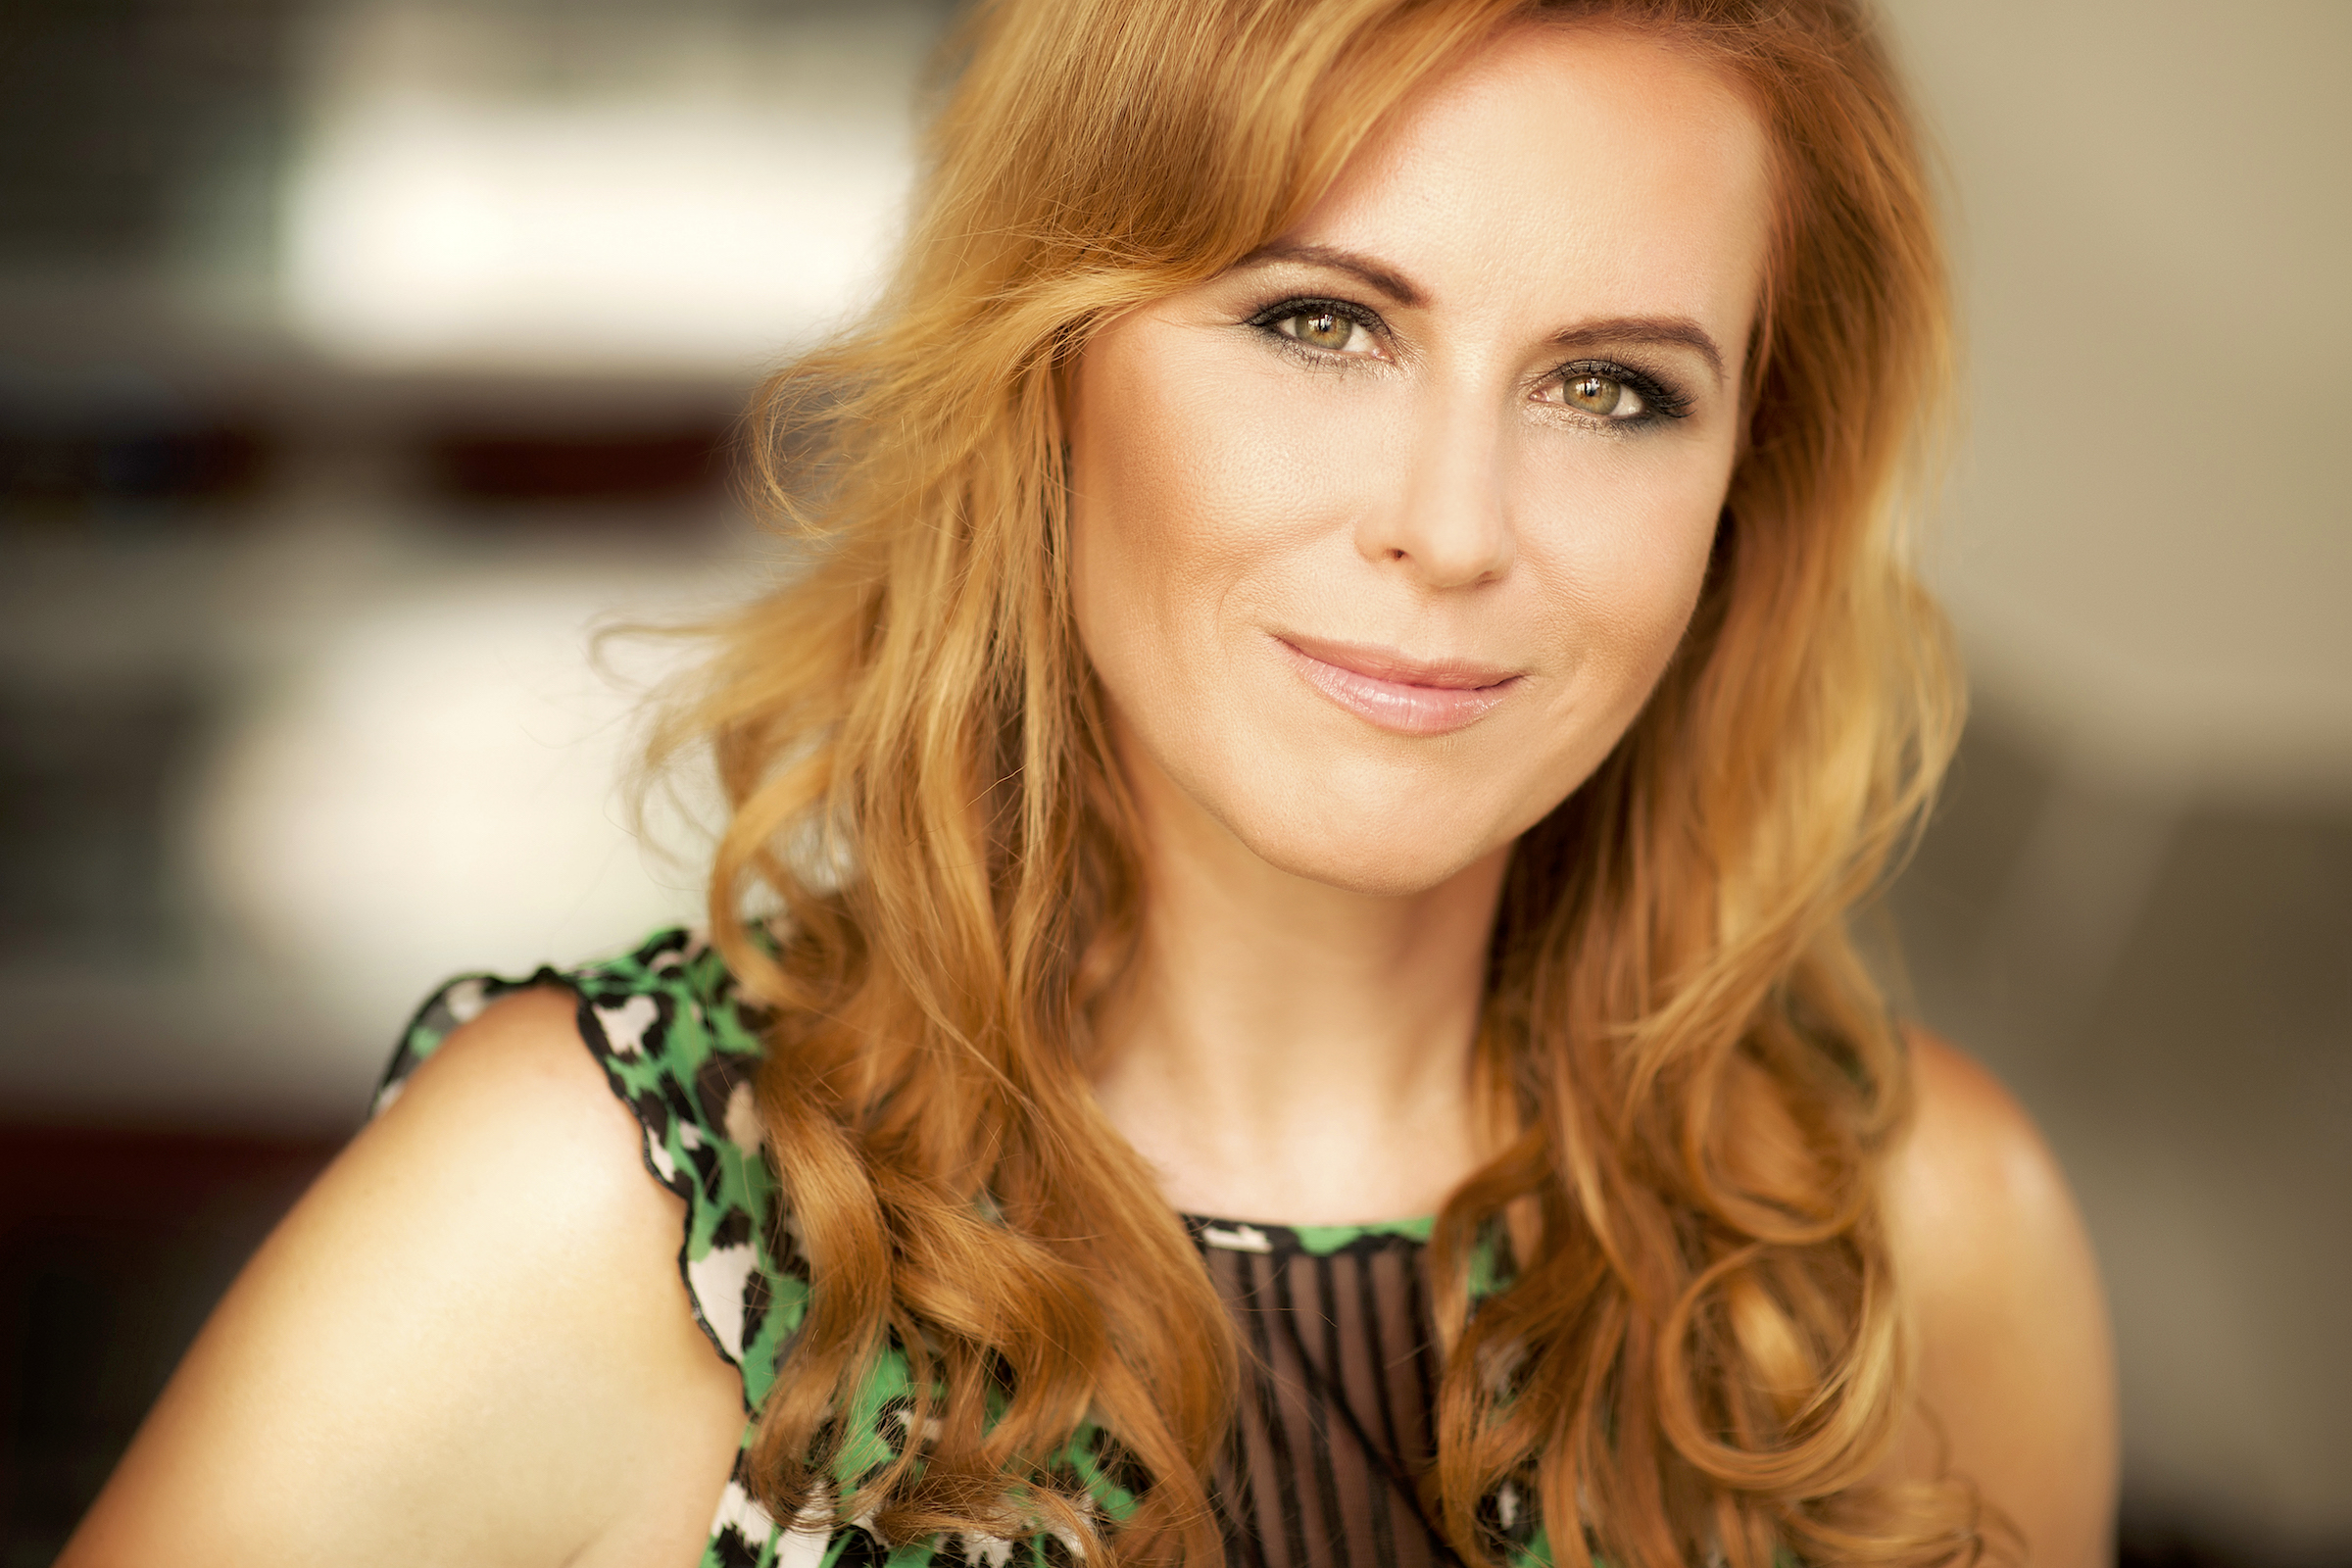 Erika Luzsicza